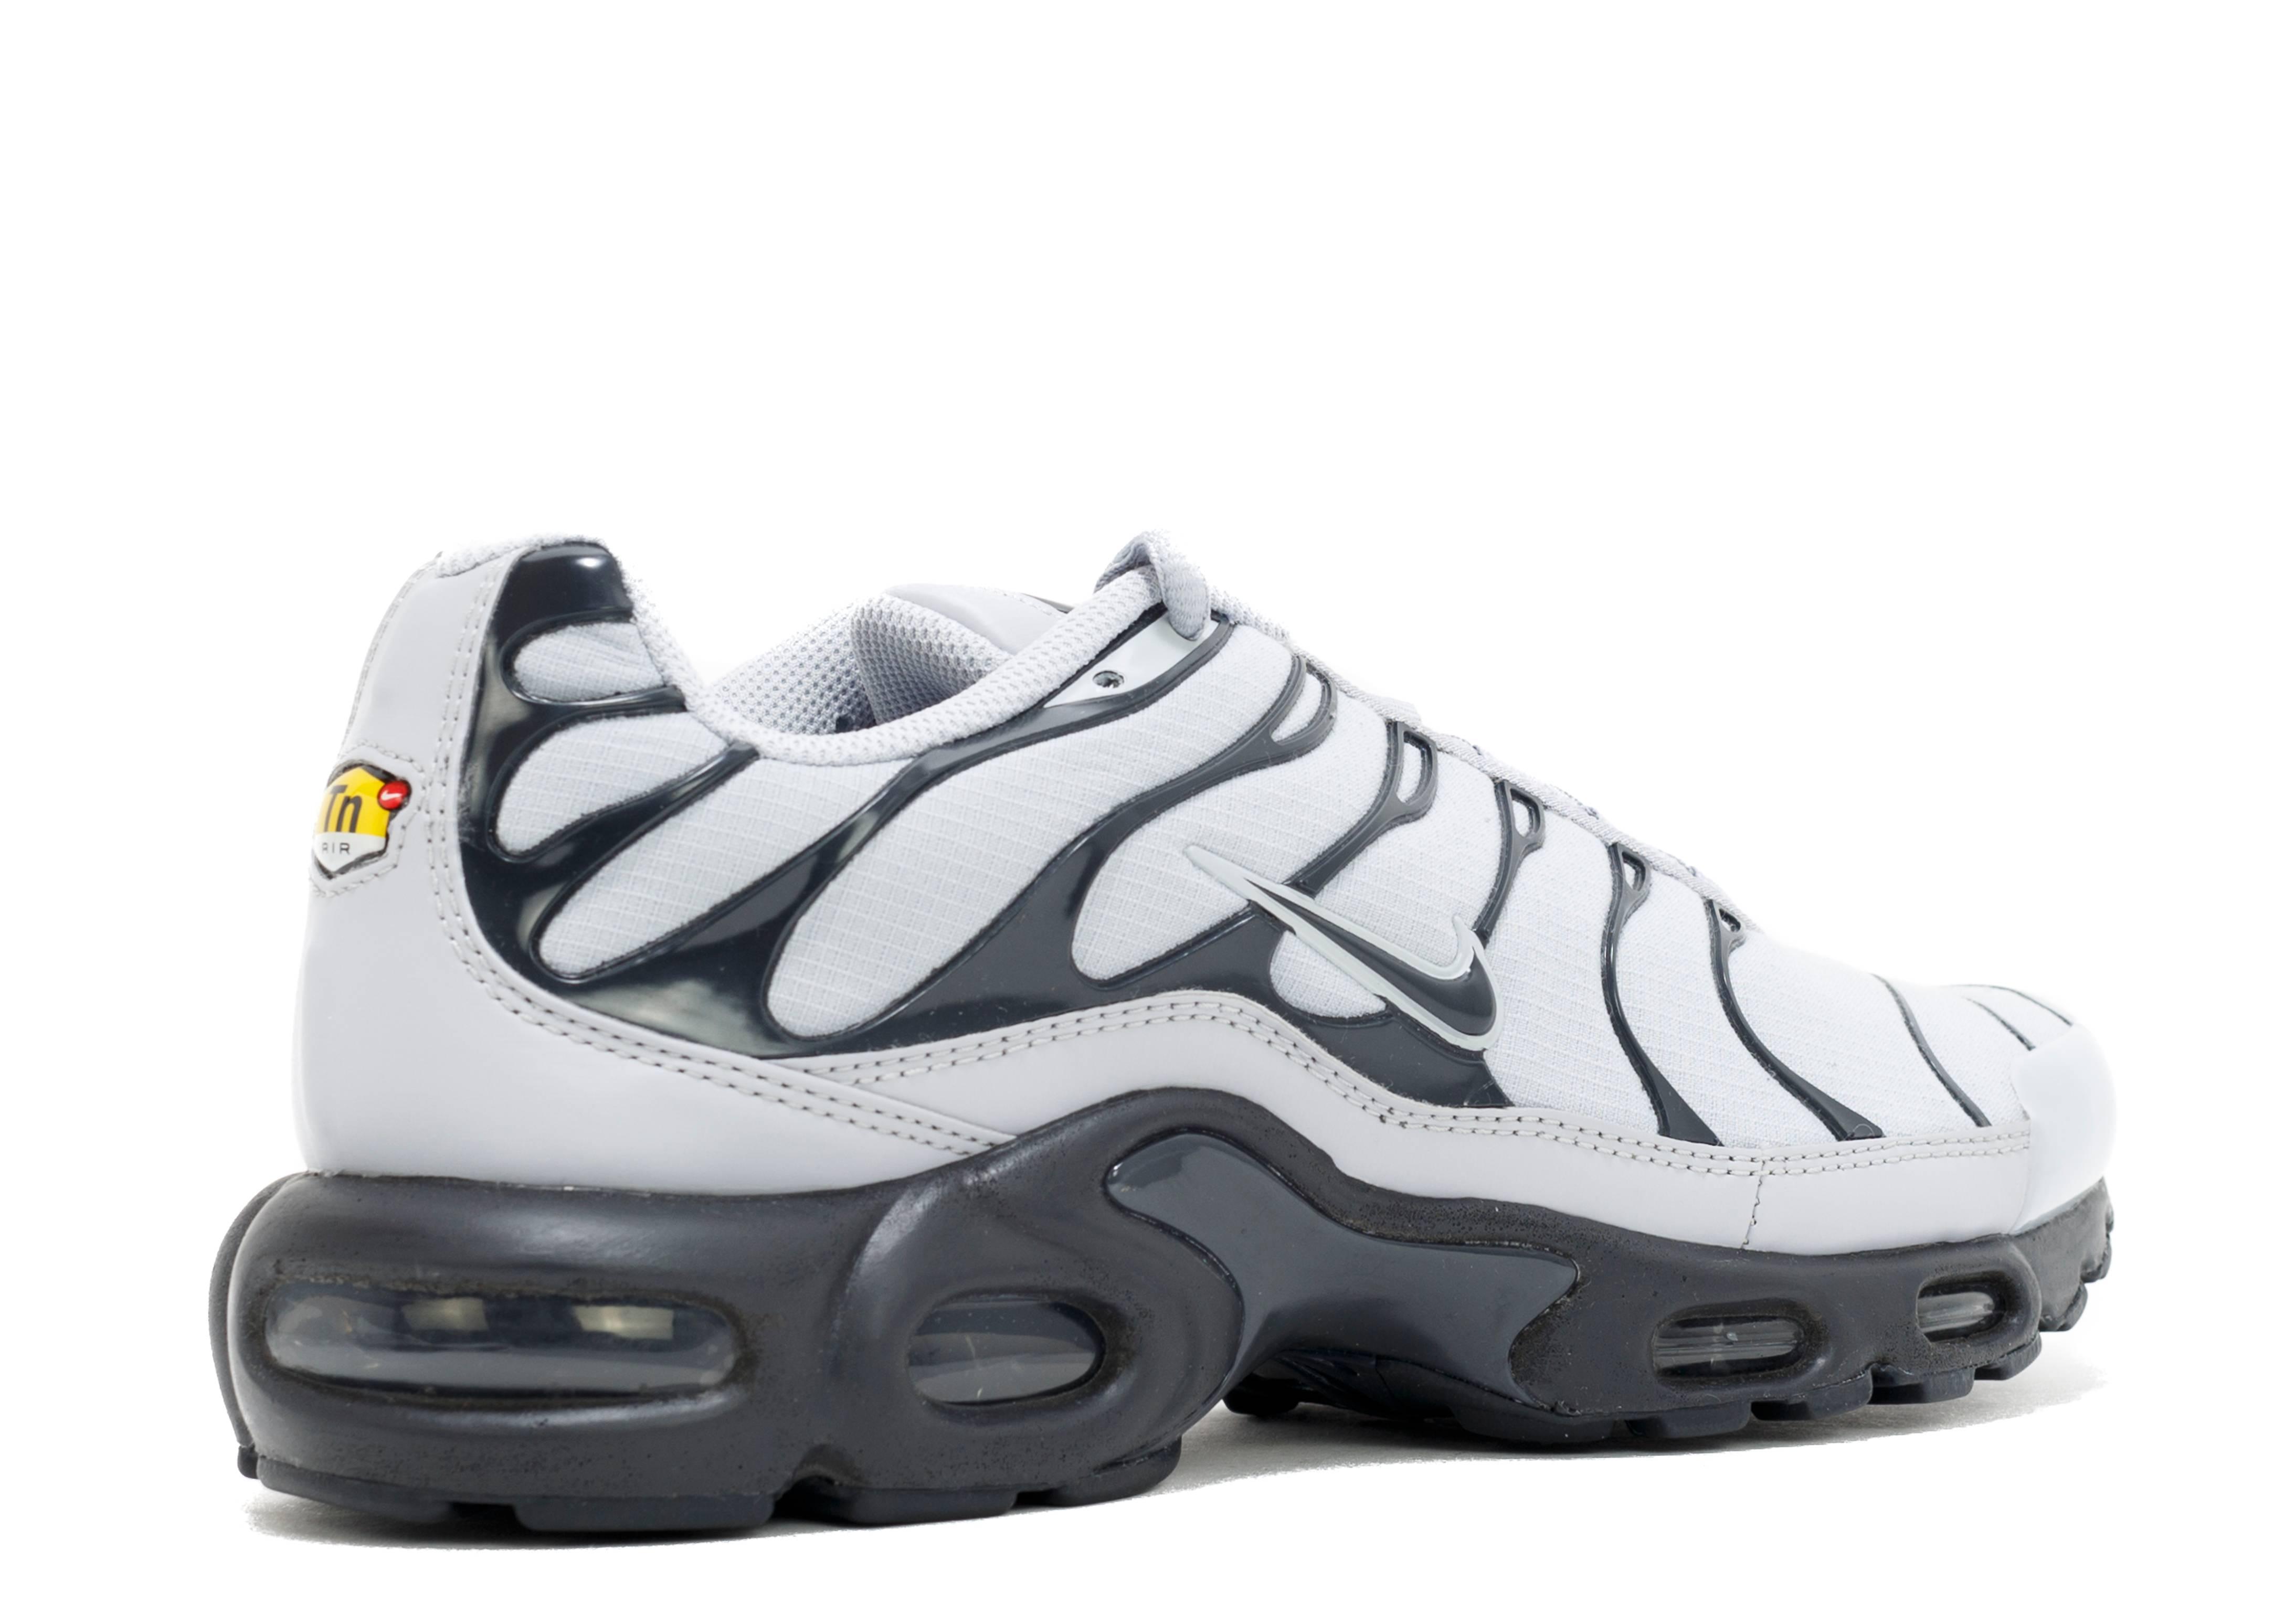 Air Max Plus Txt - Nike - 647315 099 - wolf grey/mtlc hmtt ...